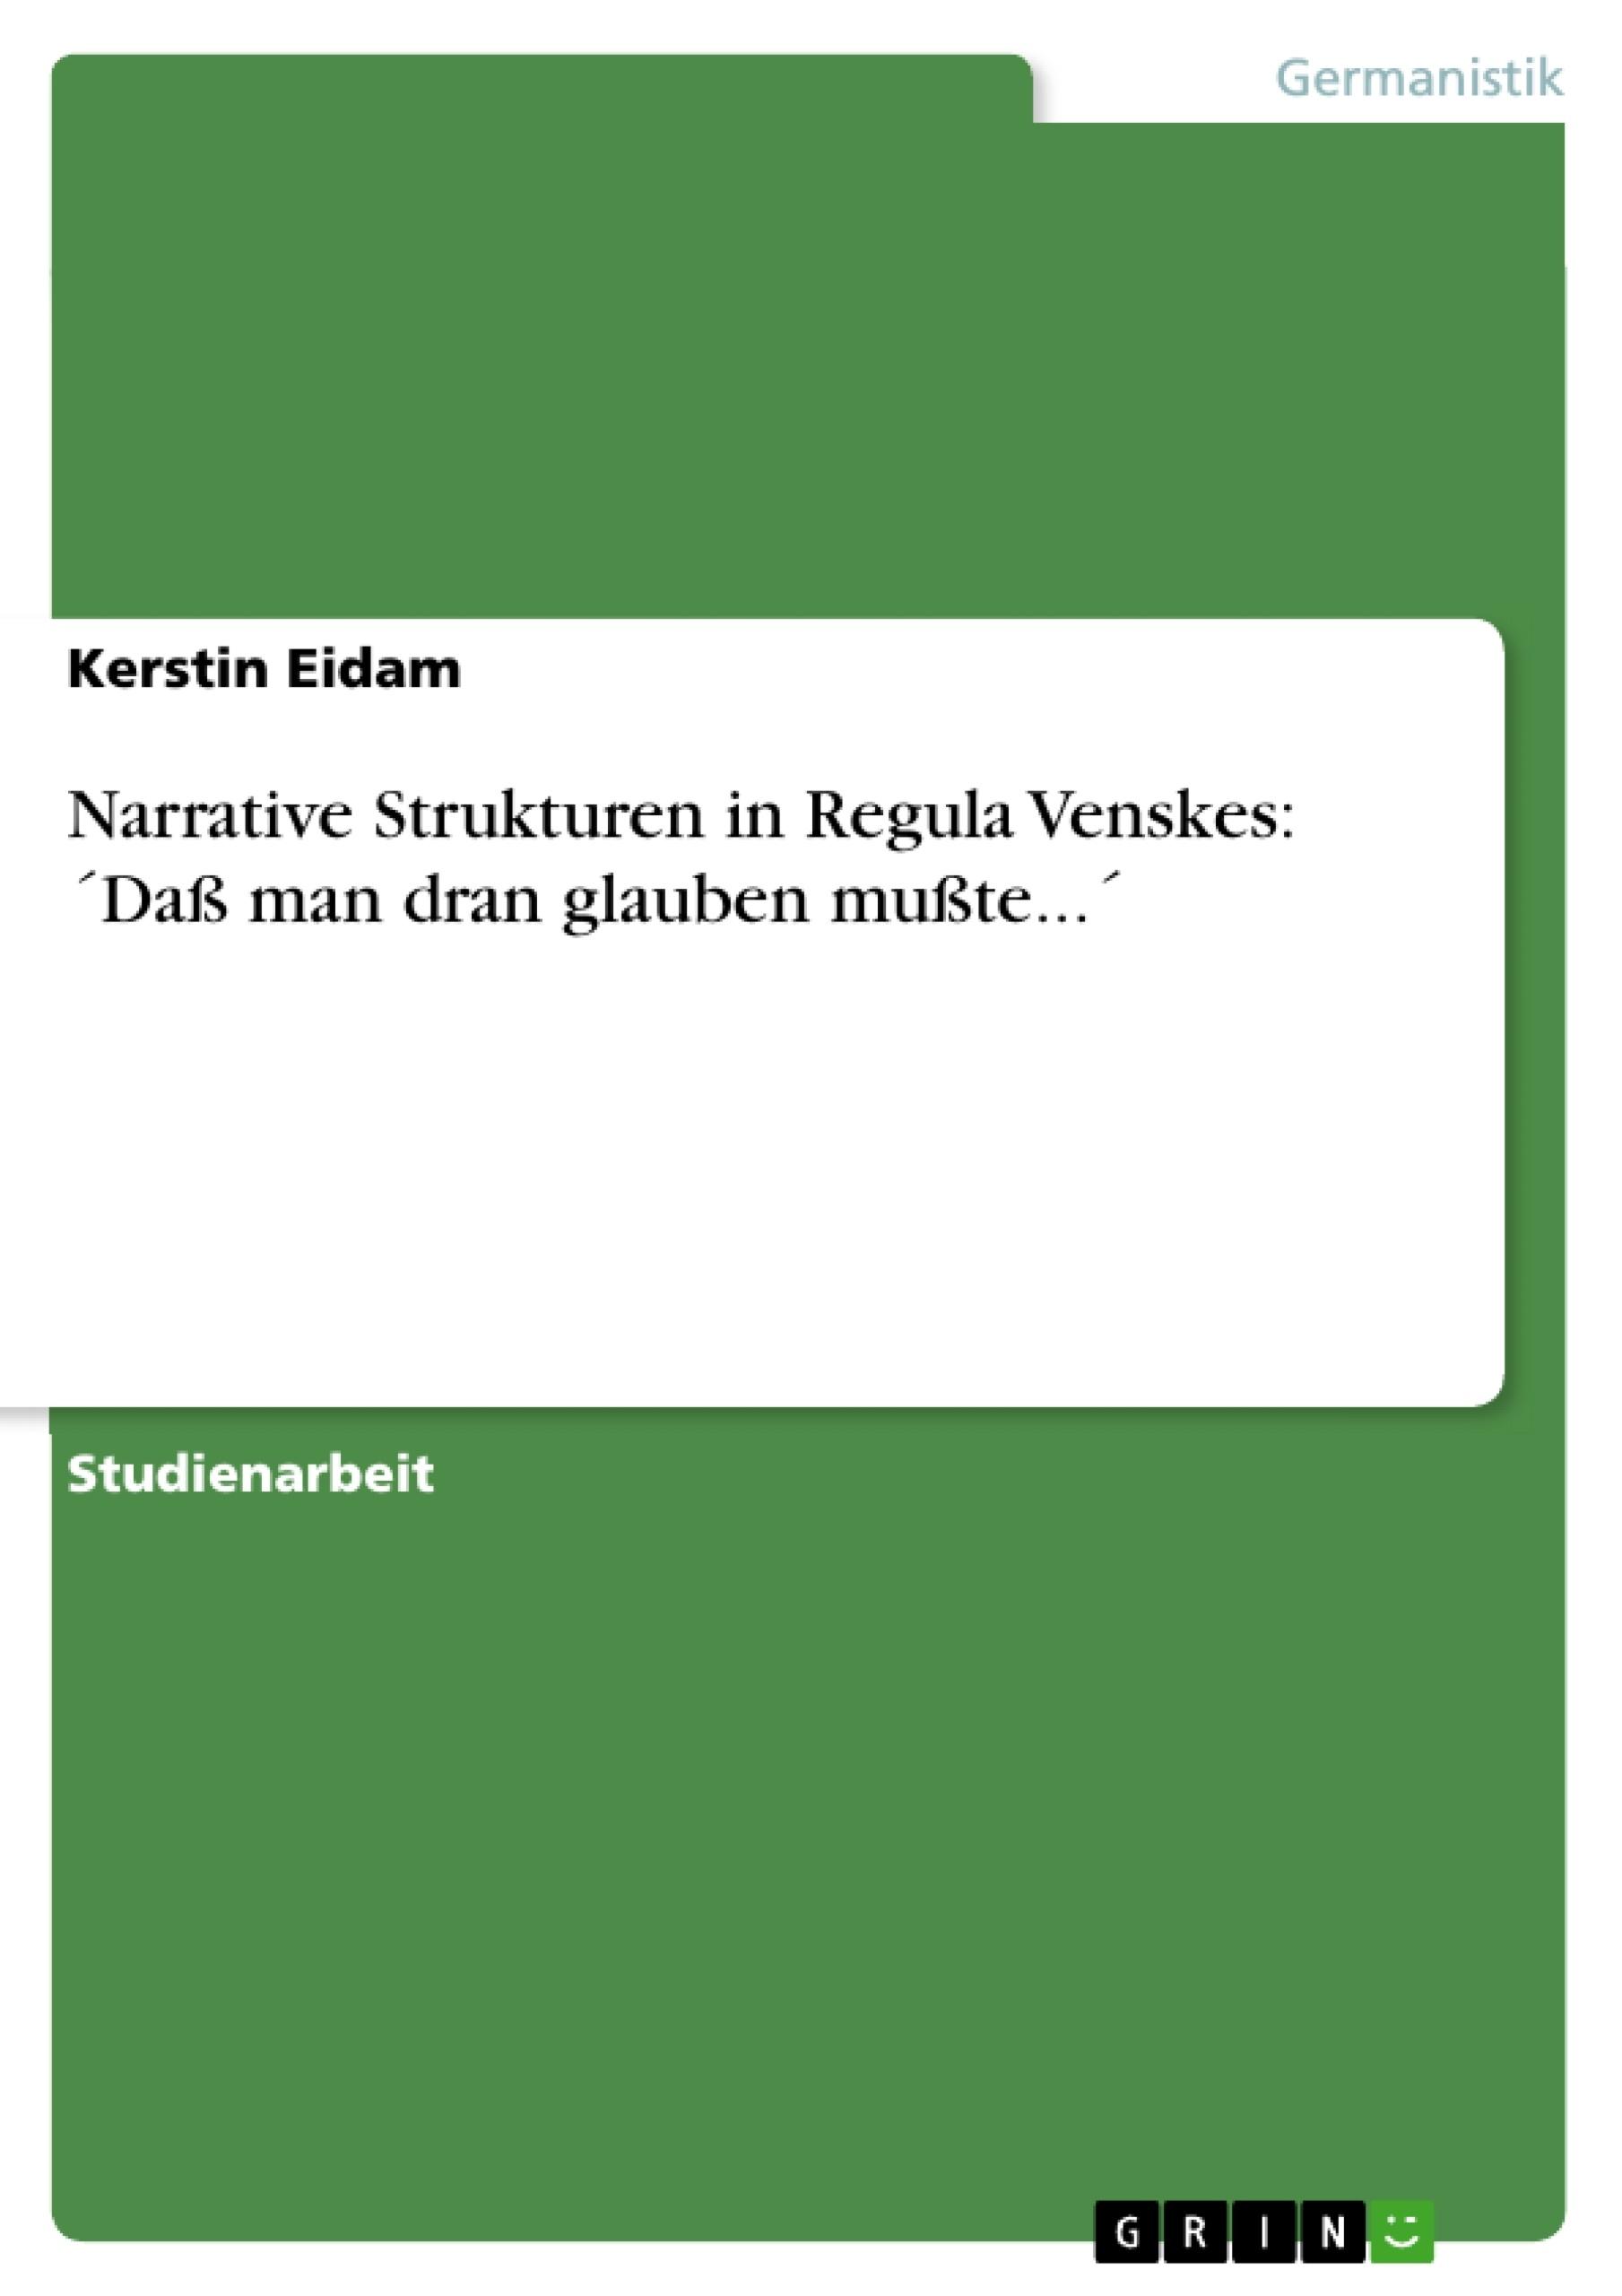 Titel: Narrative Strukturen in Regula Venskes: ´Daß man dran glauben mußte...´